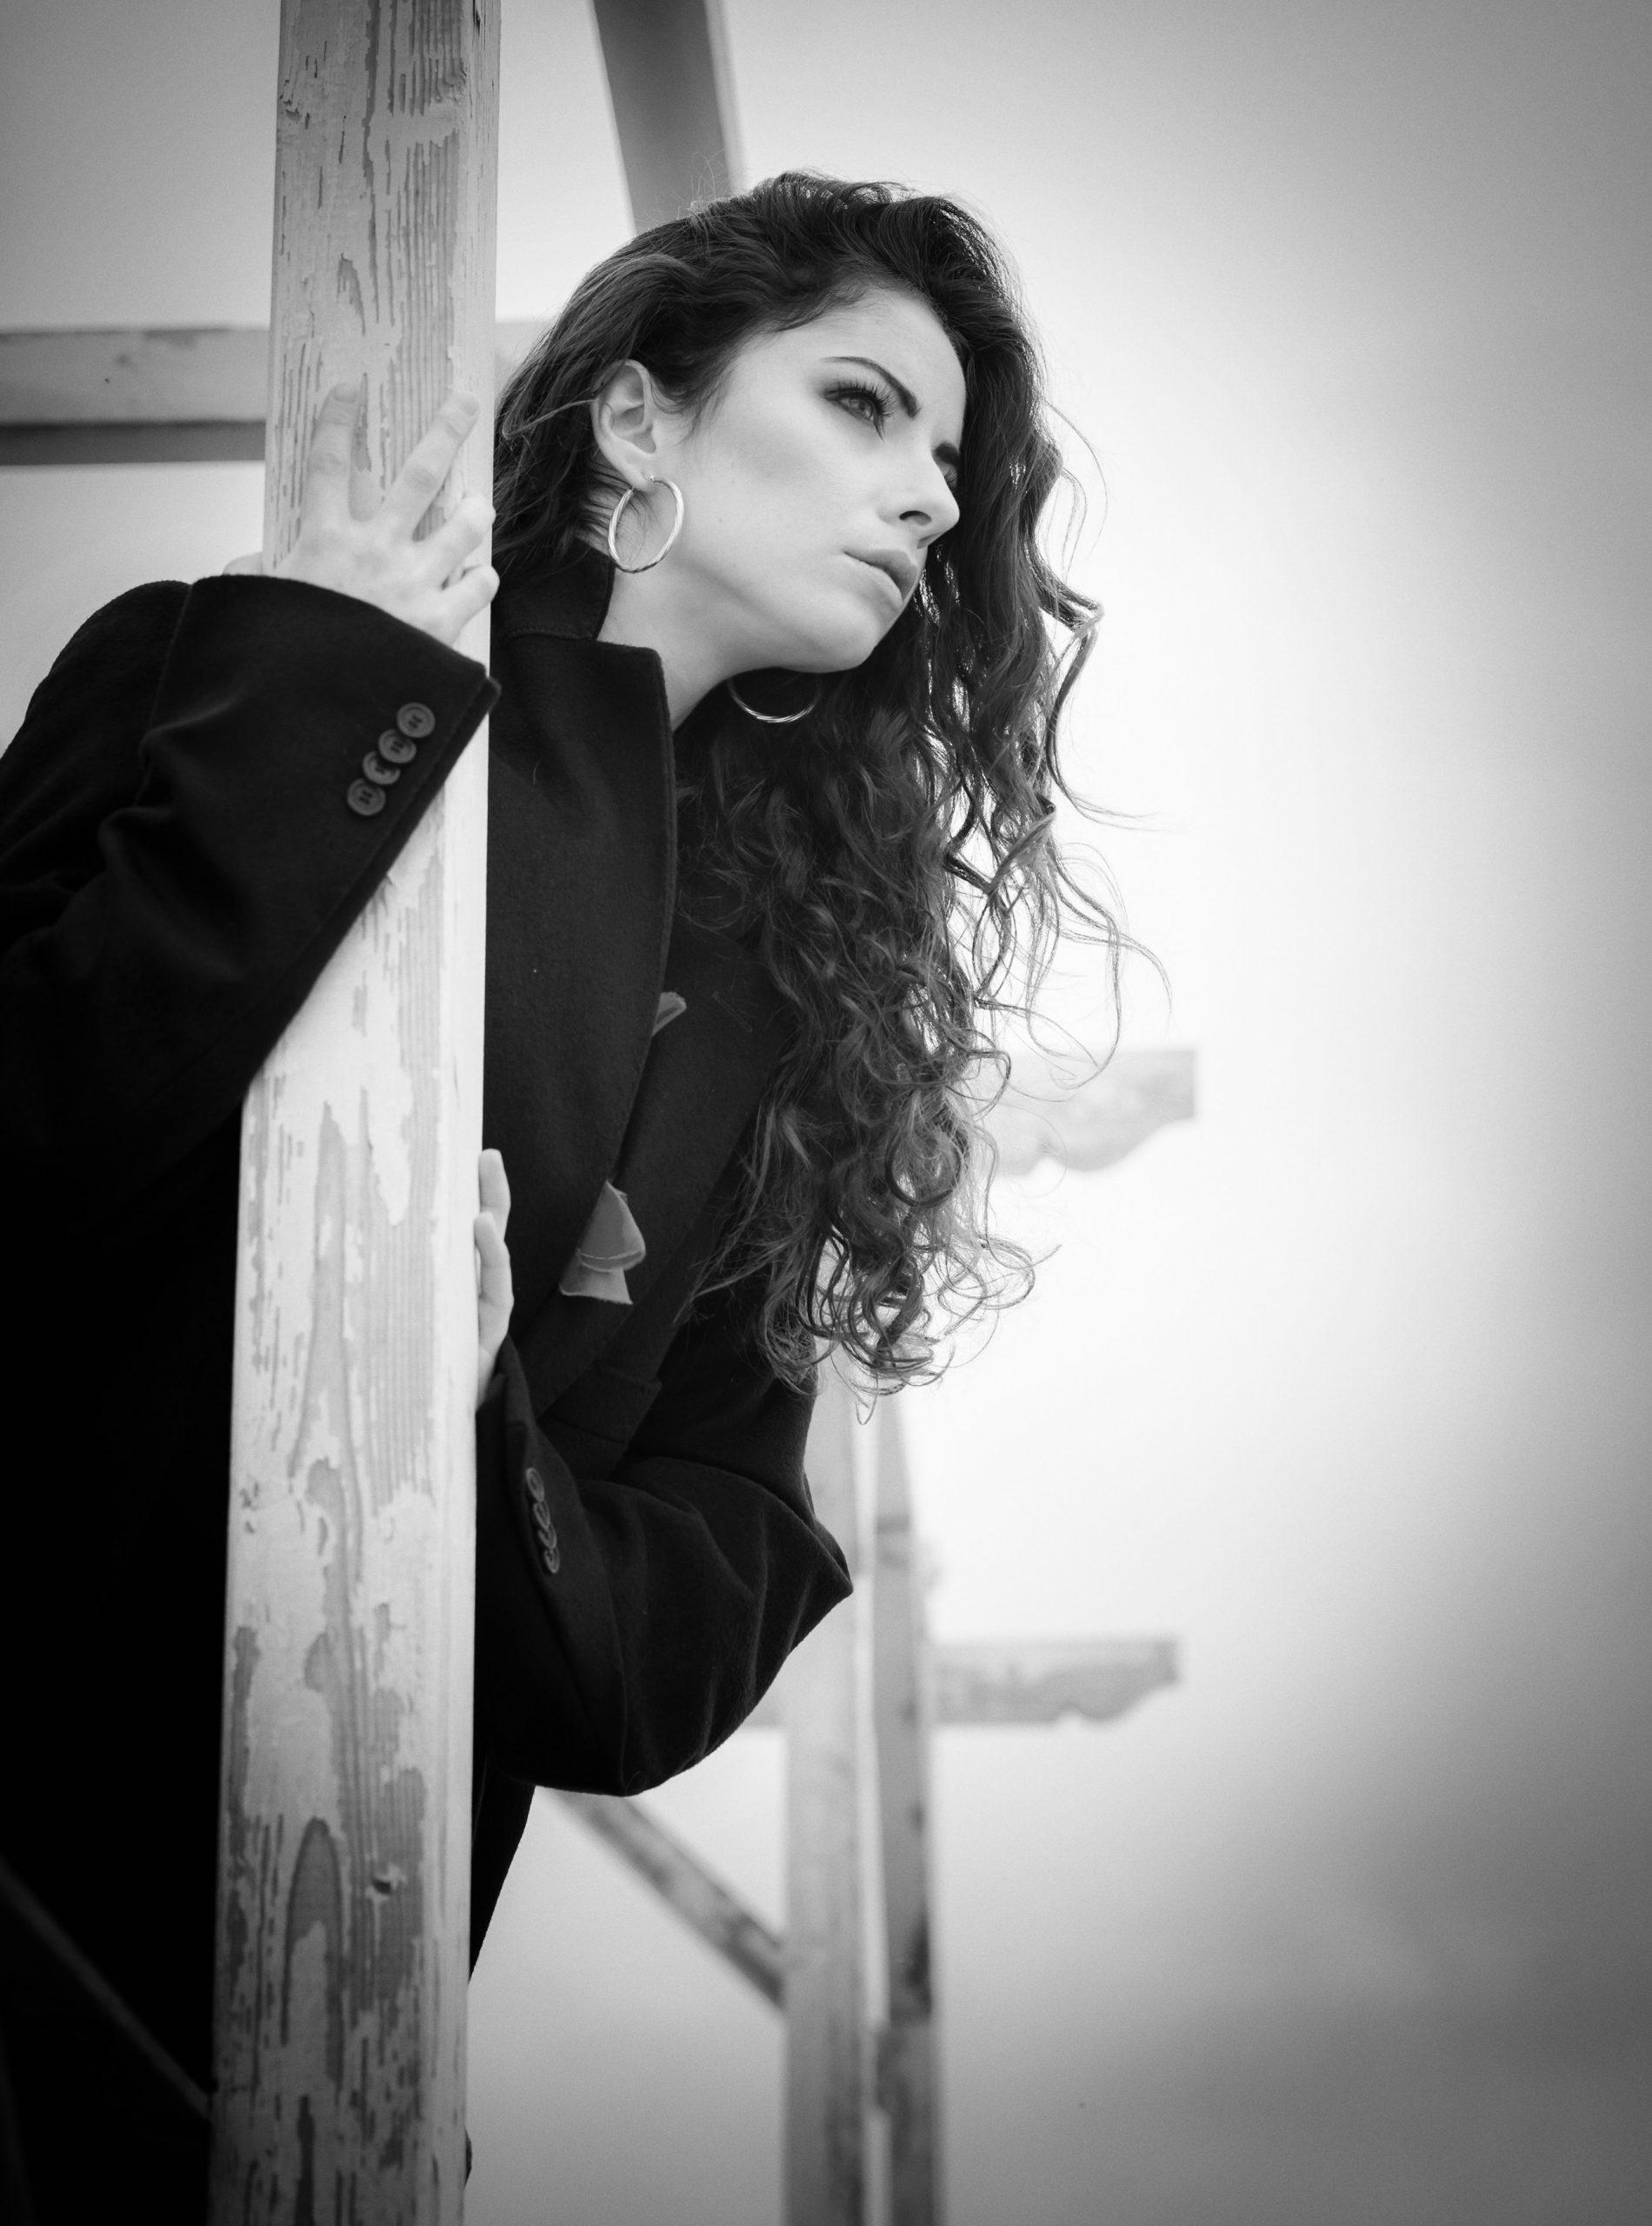 Categorie: Portrait - Photographer: GAETANO PASTORE; Model & Dancer: MIKI KRAVIZ; Mua: CRISTINA DI GIACOPO - Location: Ostia